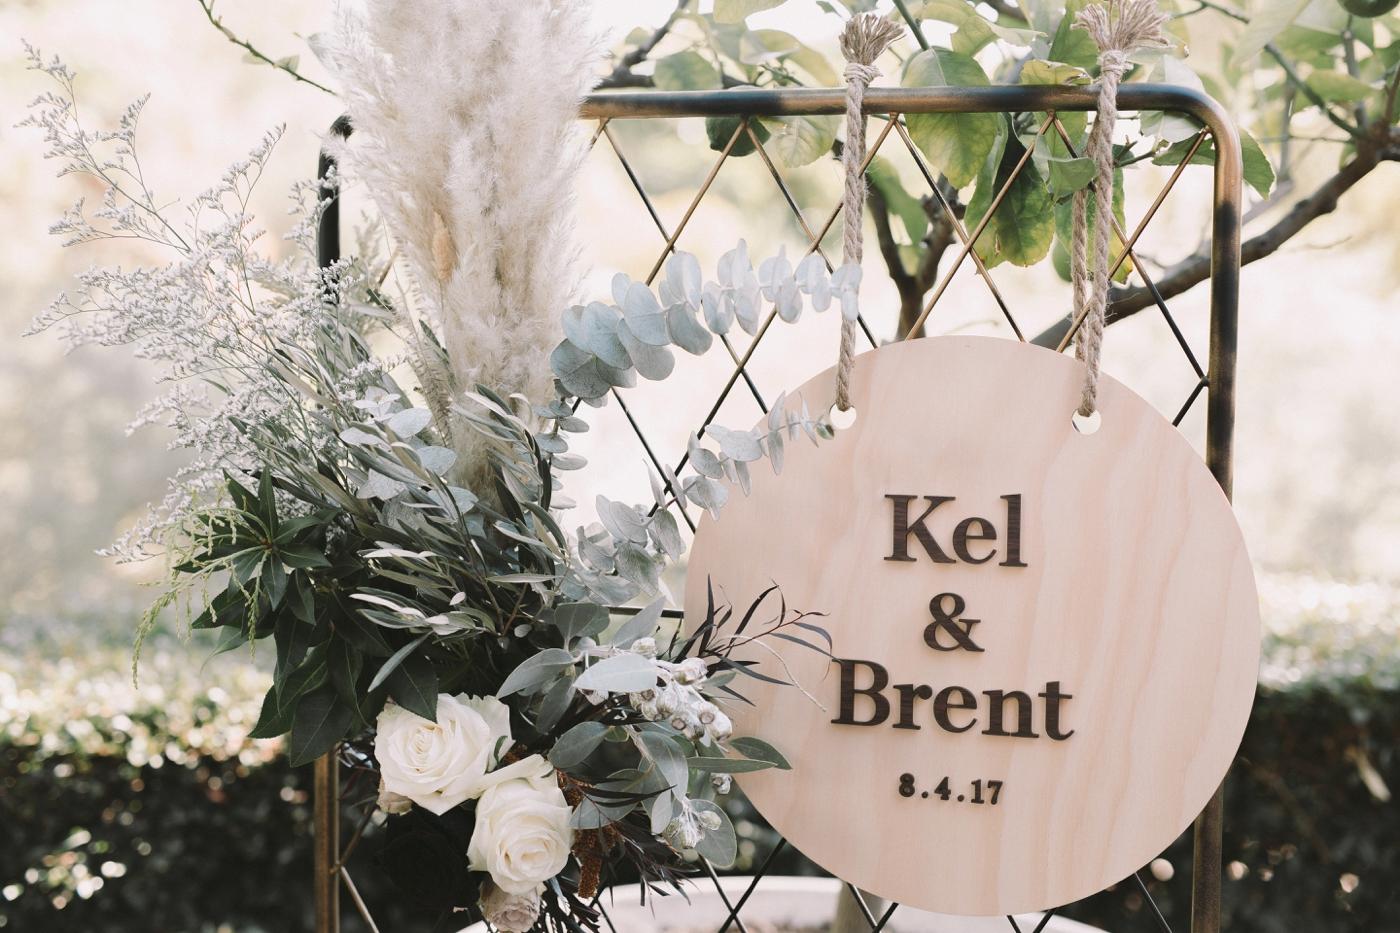 Kellie & Brent - Adelaide City Wedding - Natural wedding photography in Adelaide - Katherine Schultz - www.katherineschultzphotography.com 16